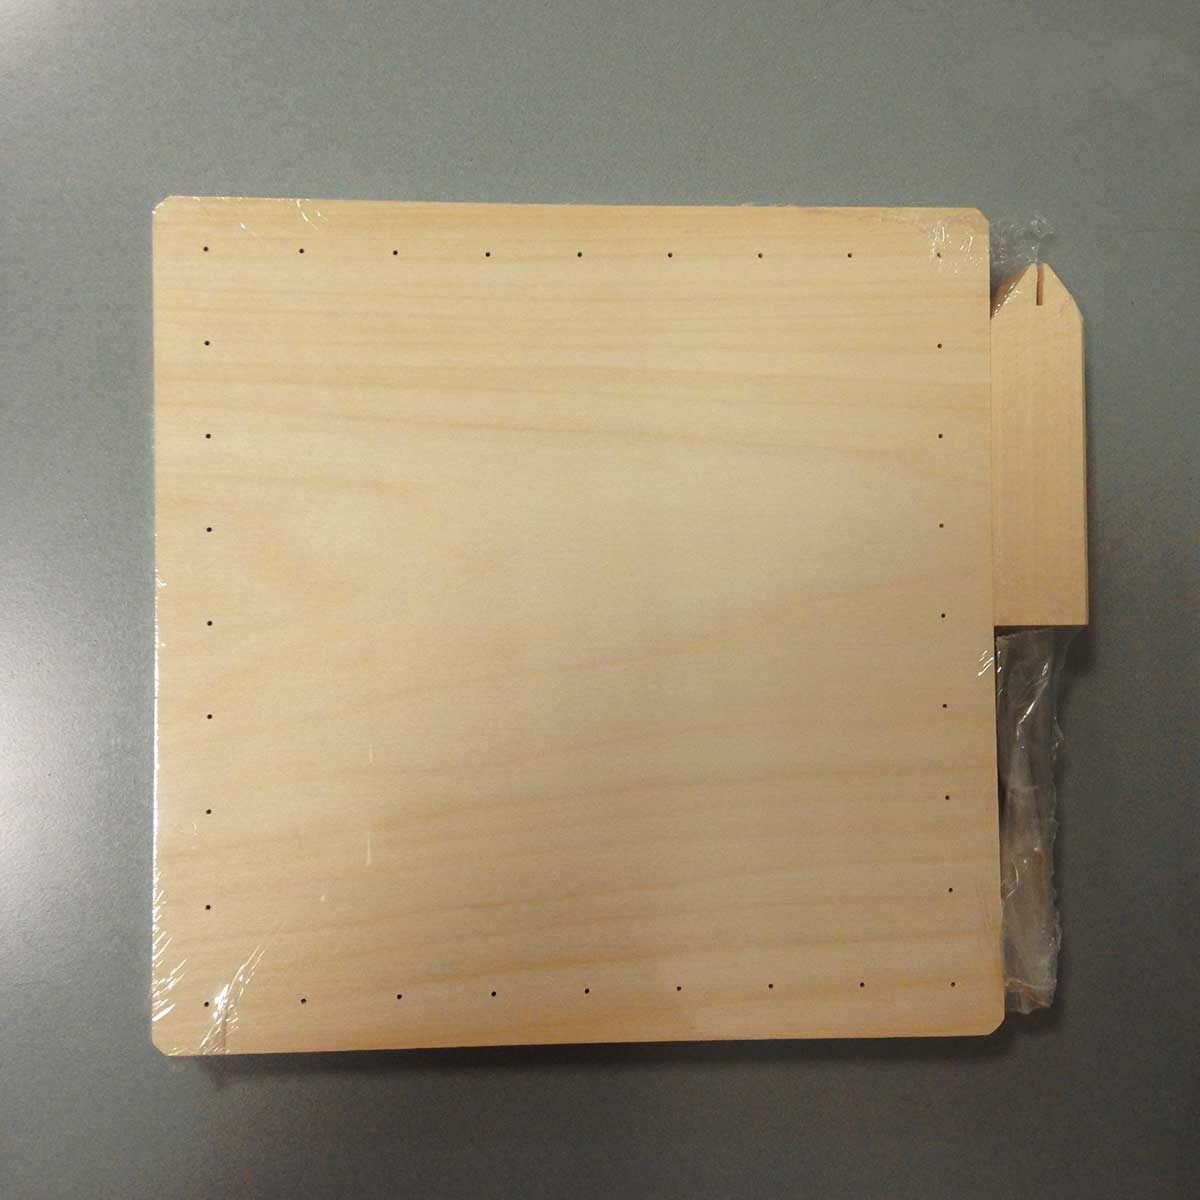 НПР-7 ПРОМЫСЕЛ Набор стринг-арт 'Квадрат' 16х16х1,5 см